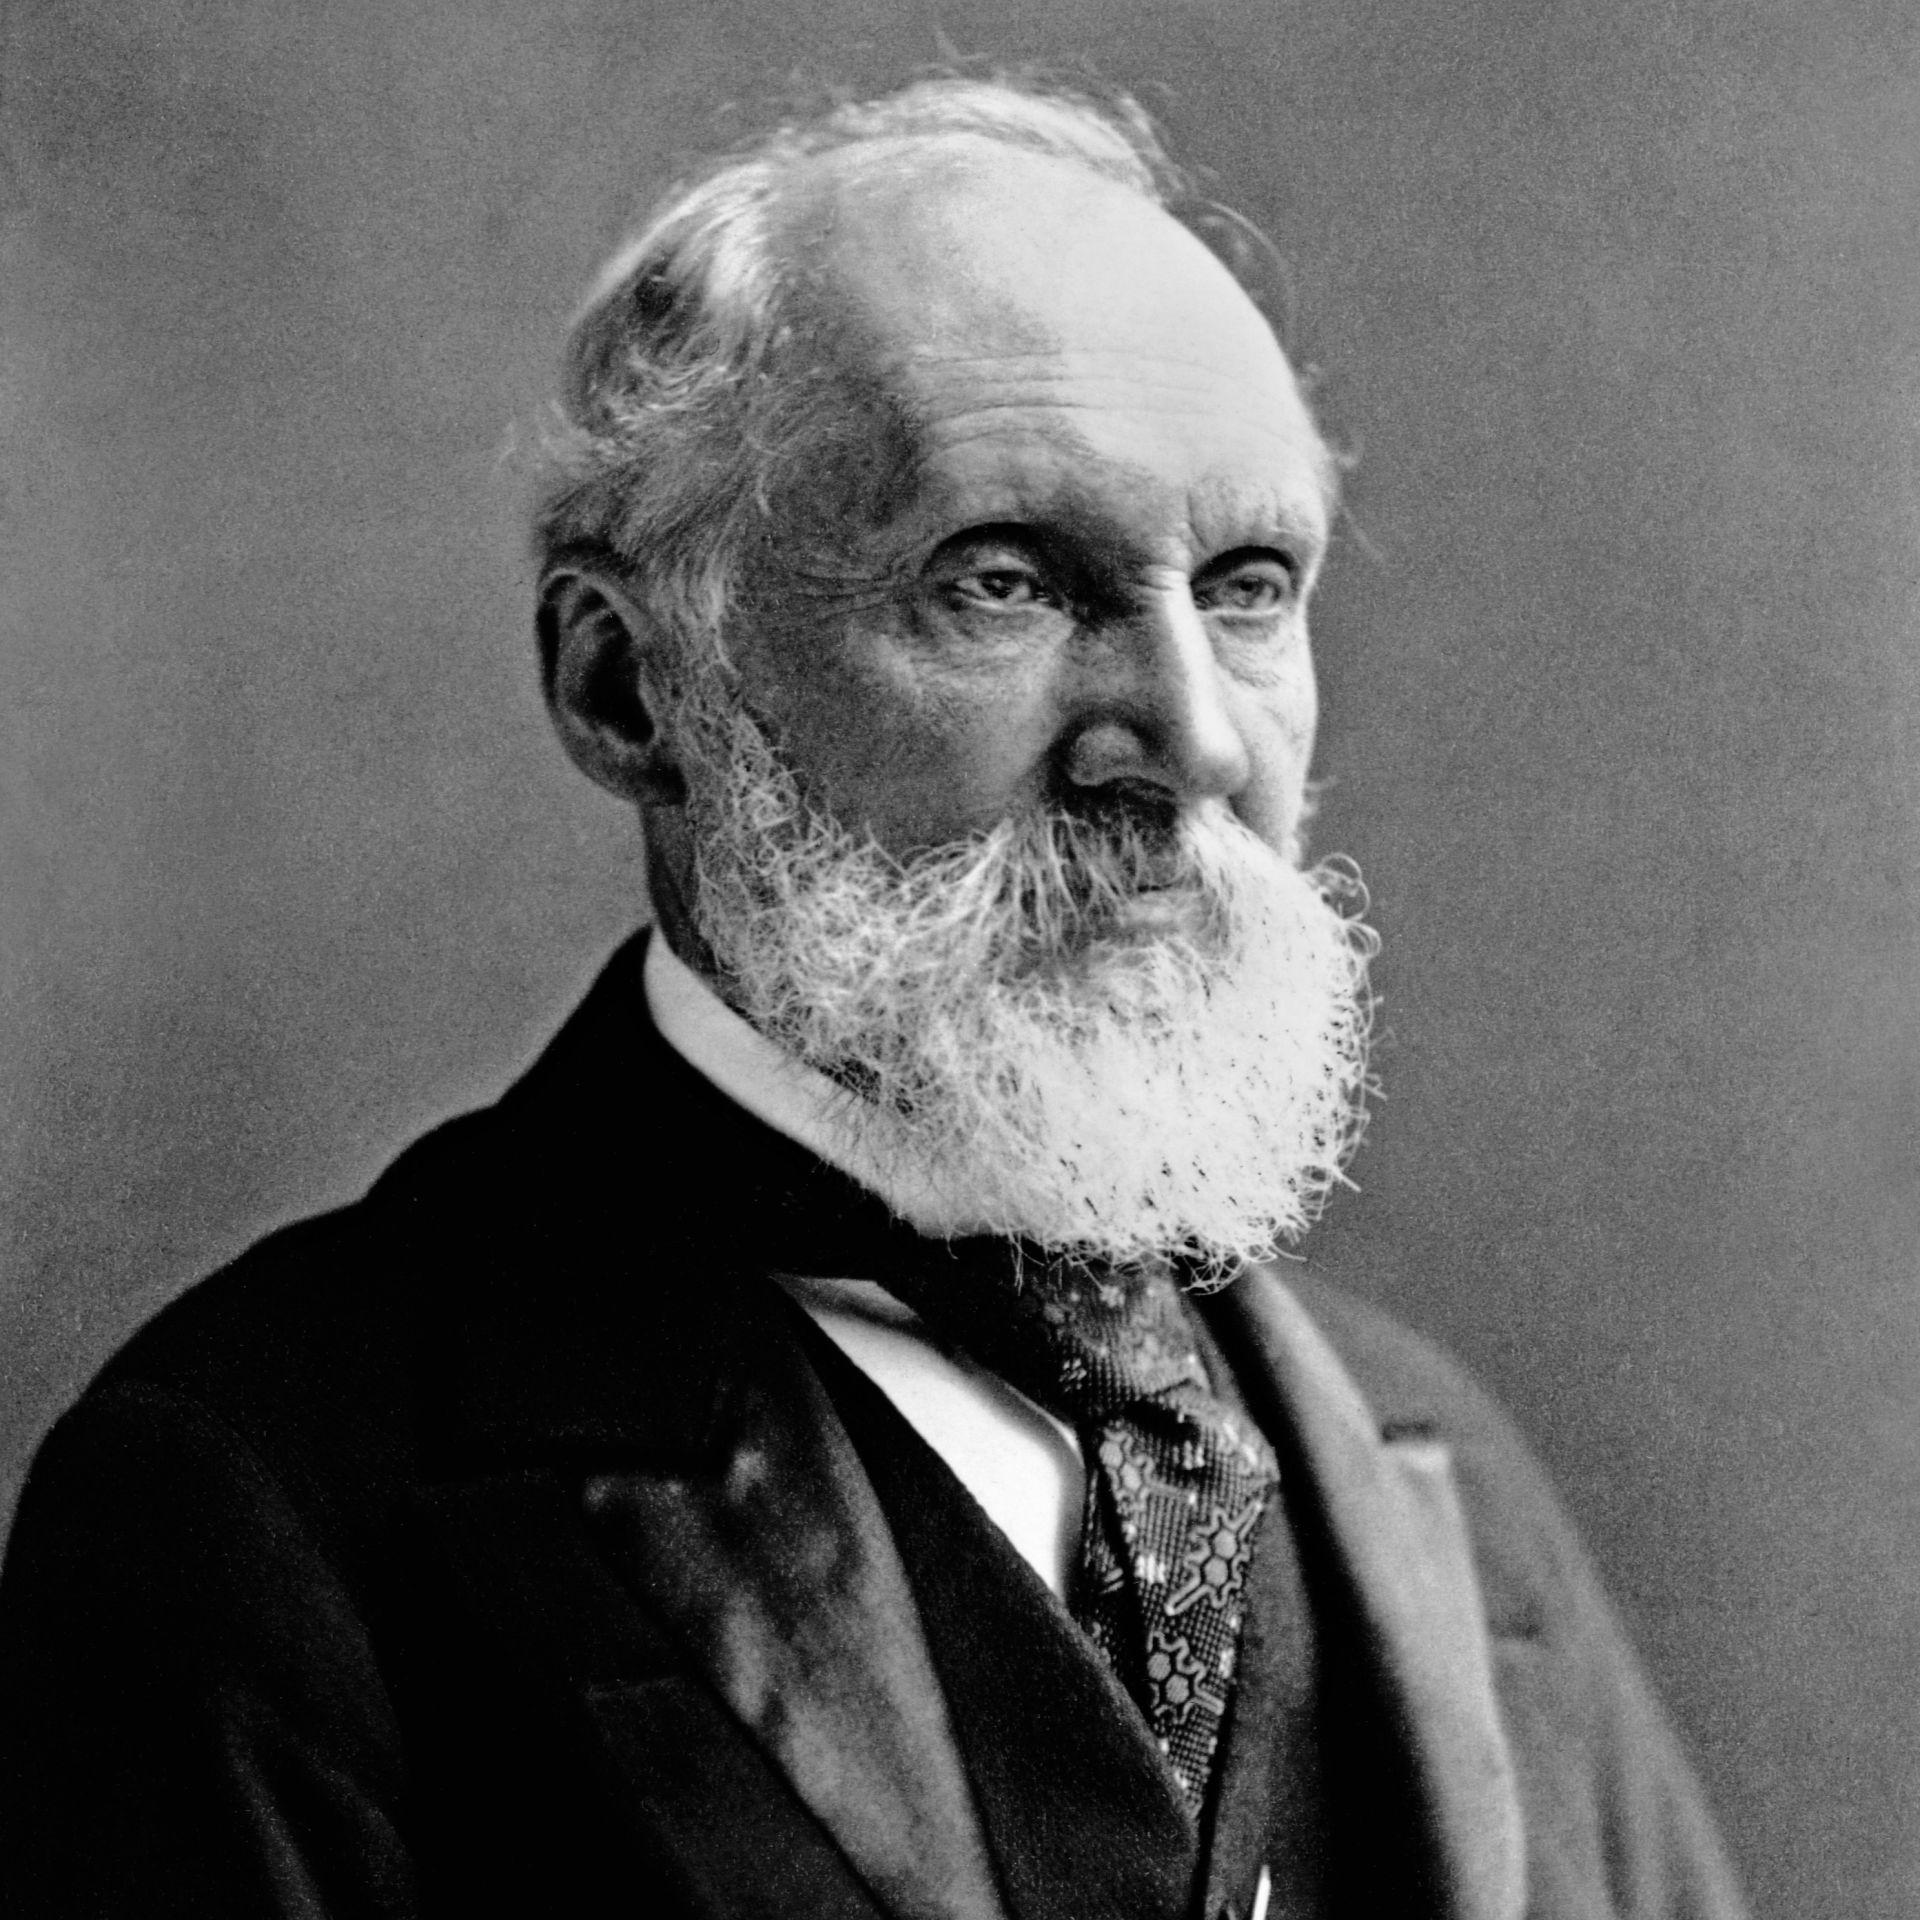 Sir William Thomson, Lord Kelvin (1824 – 1907)